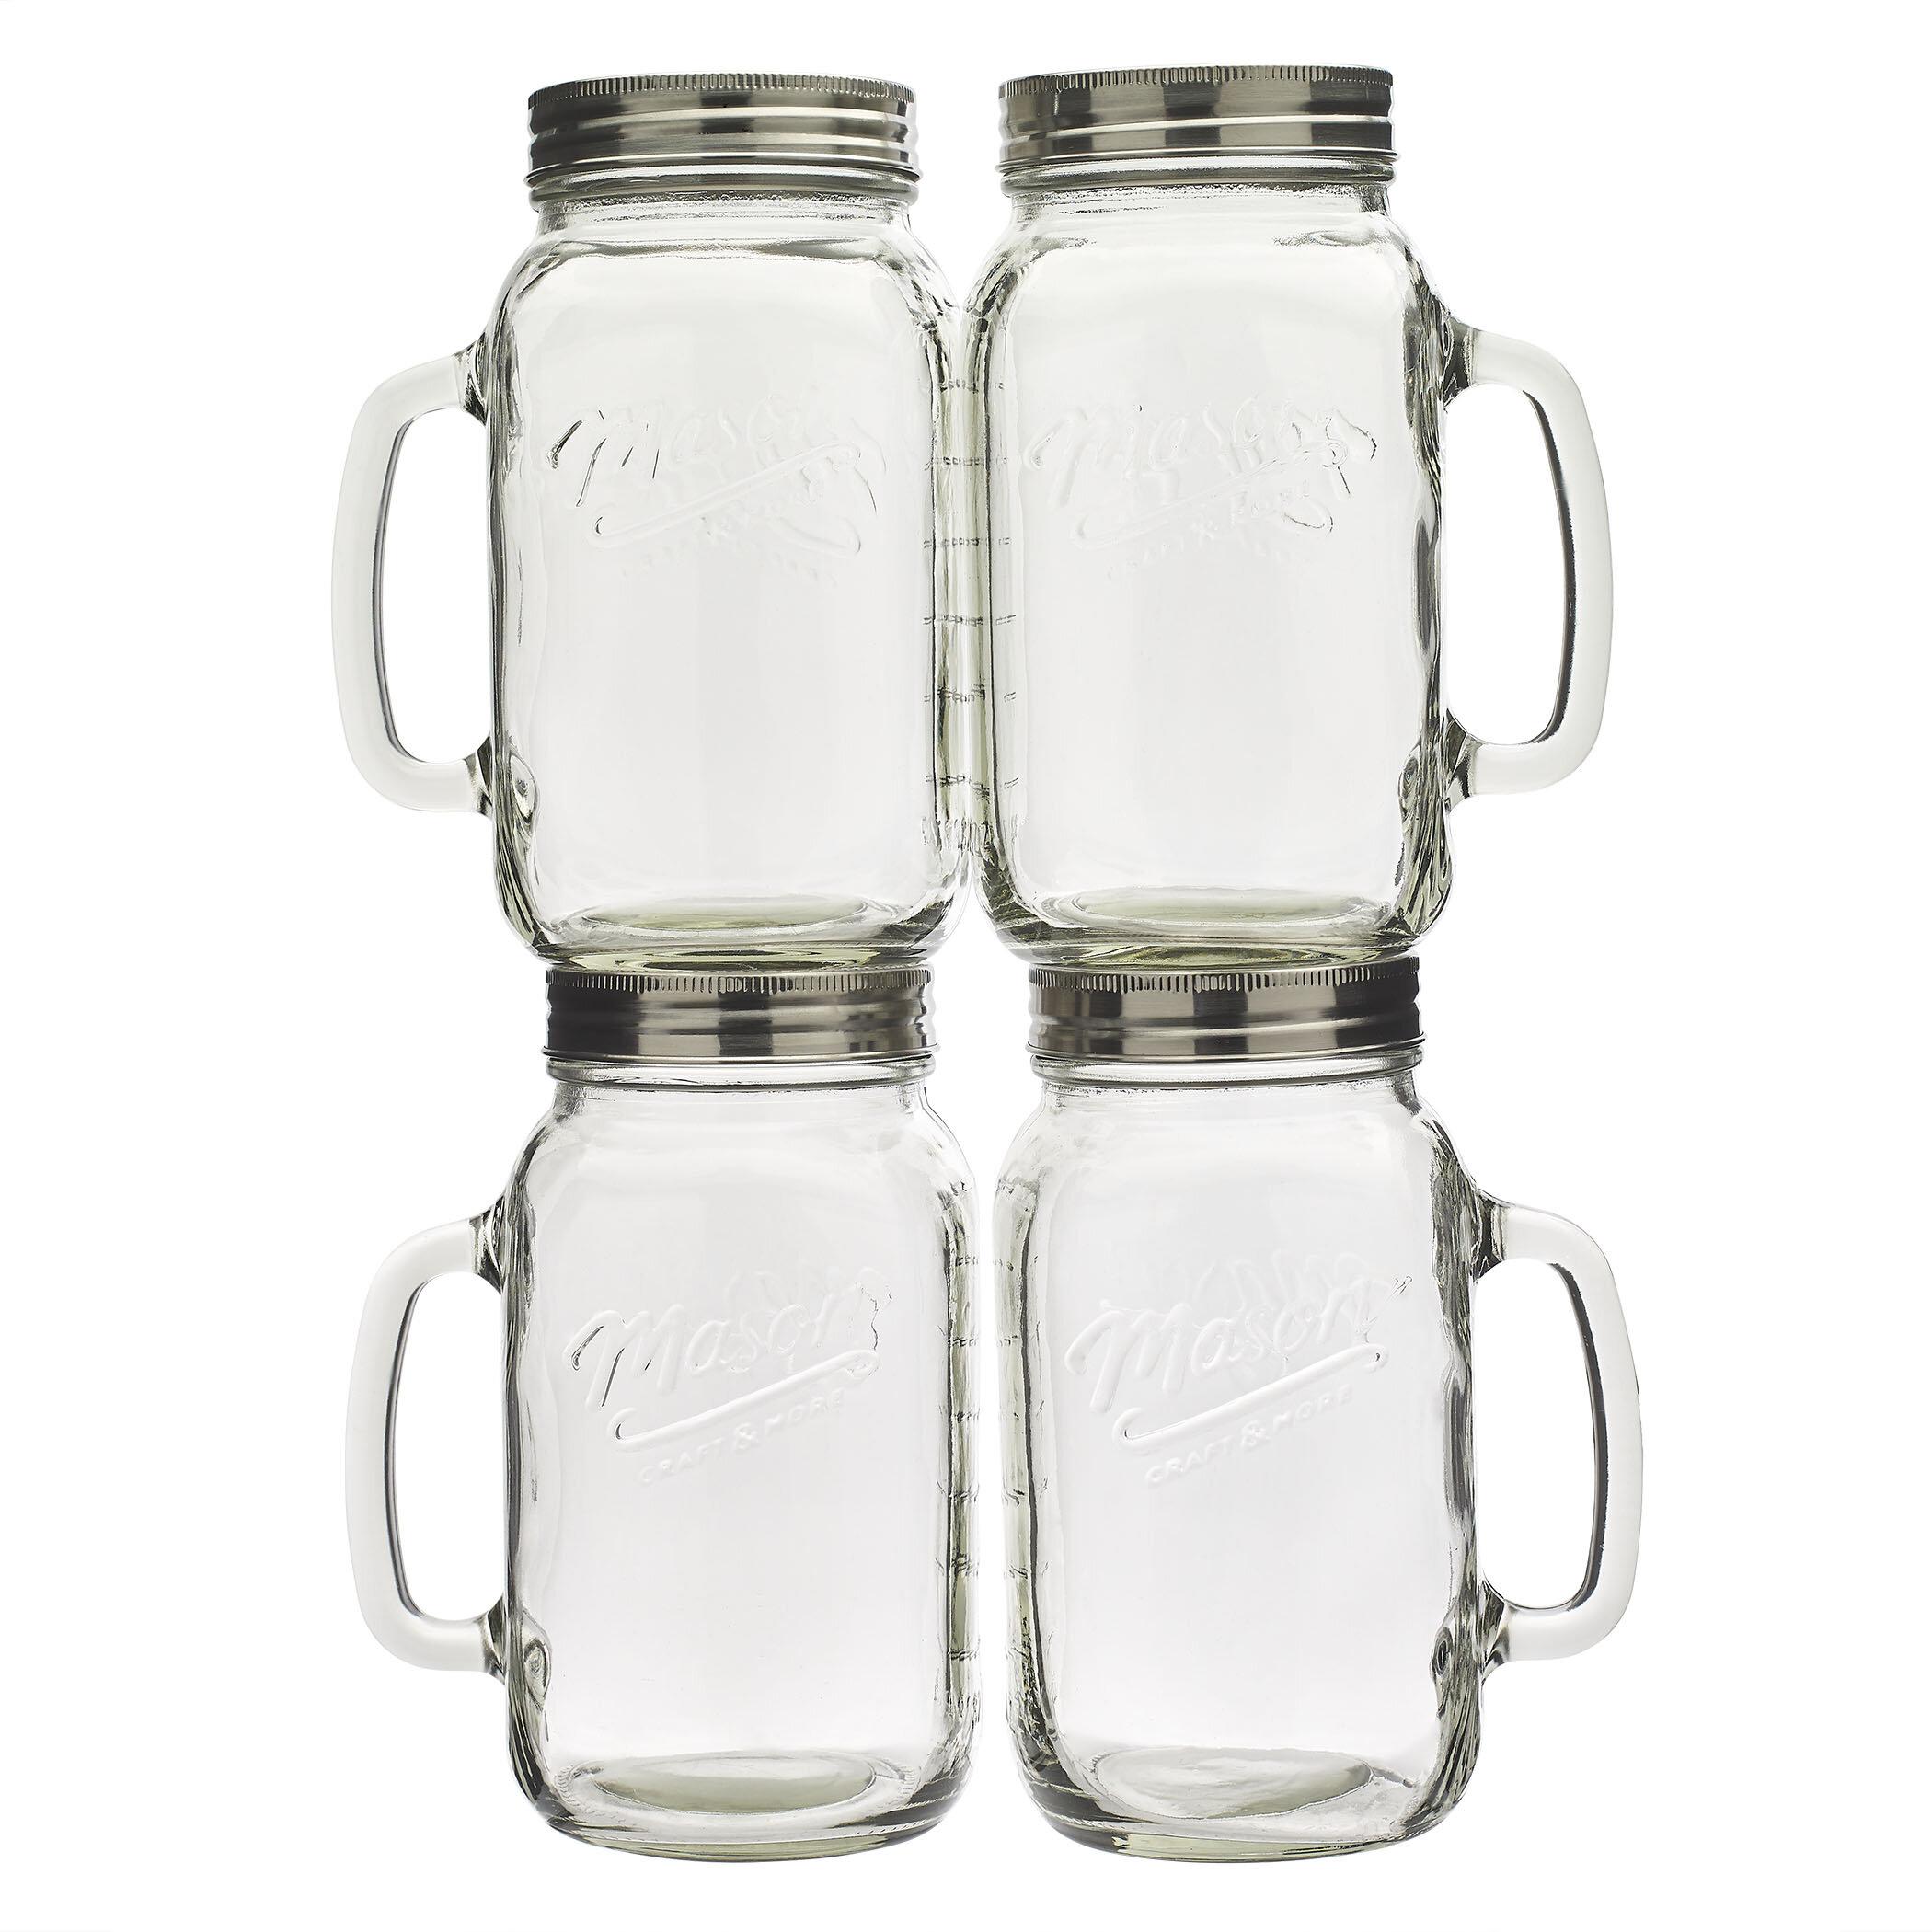 4 piece 32 oz mason jar set